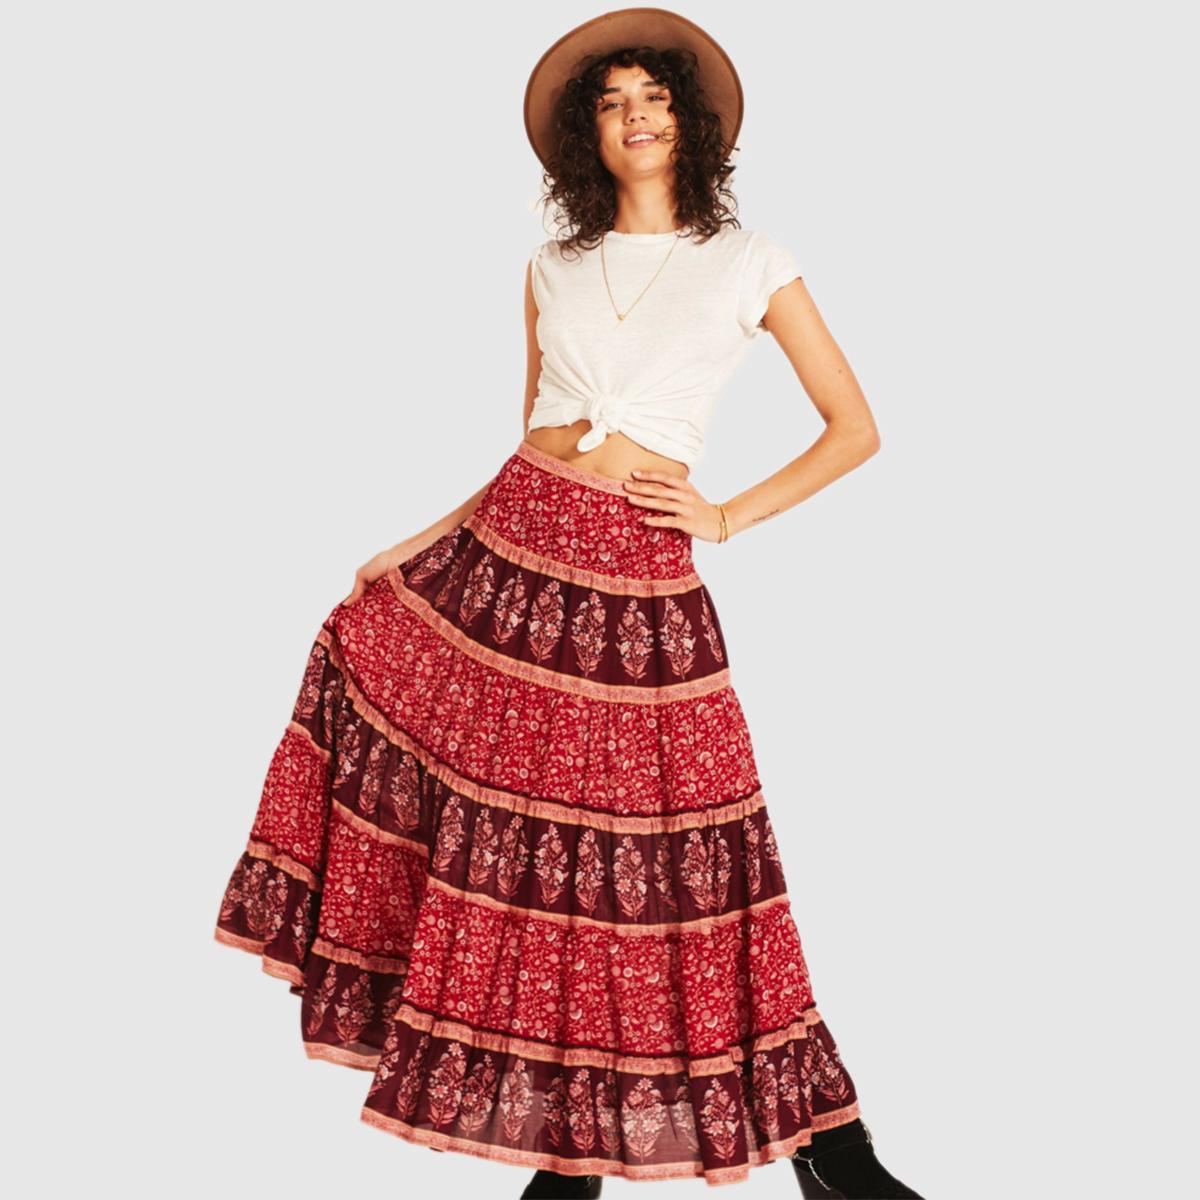 41eb90d5ad671 Floral Print Boho Skirt Women Summer 2018 Maxi Skirts Casual Beach Long  Gypsy Hem Bohemian Retro Long Hippie Pleated Skirt J190426